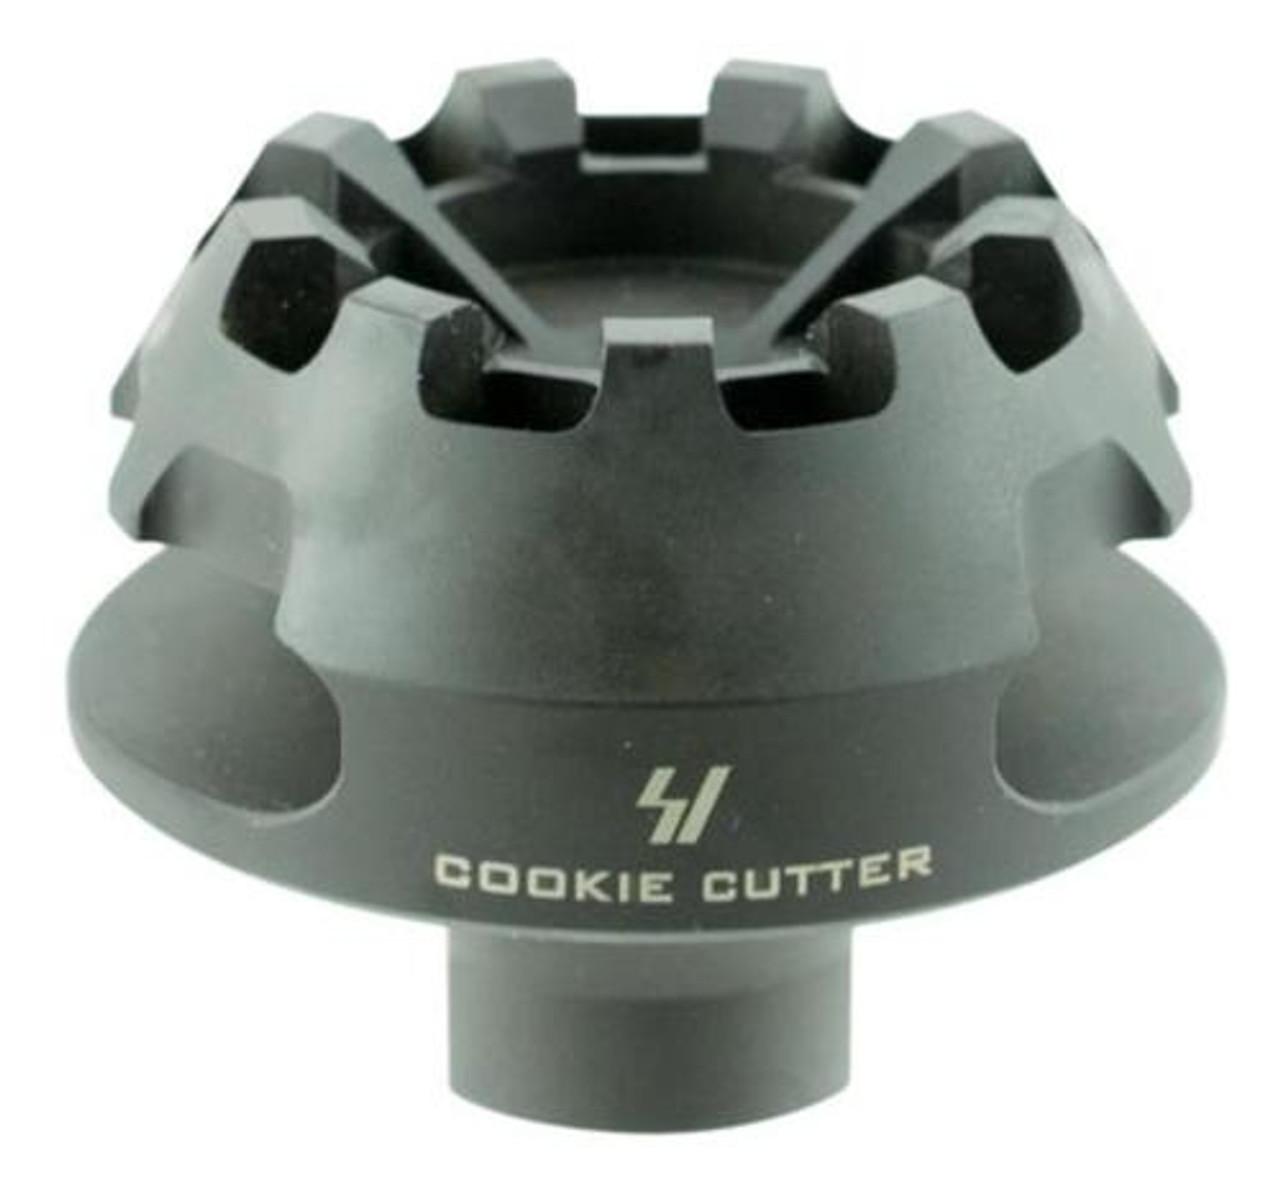 Q5 22 223 5.56 1//2-28 Extreme Duty Q-TYPE Muzzle brake valkrie